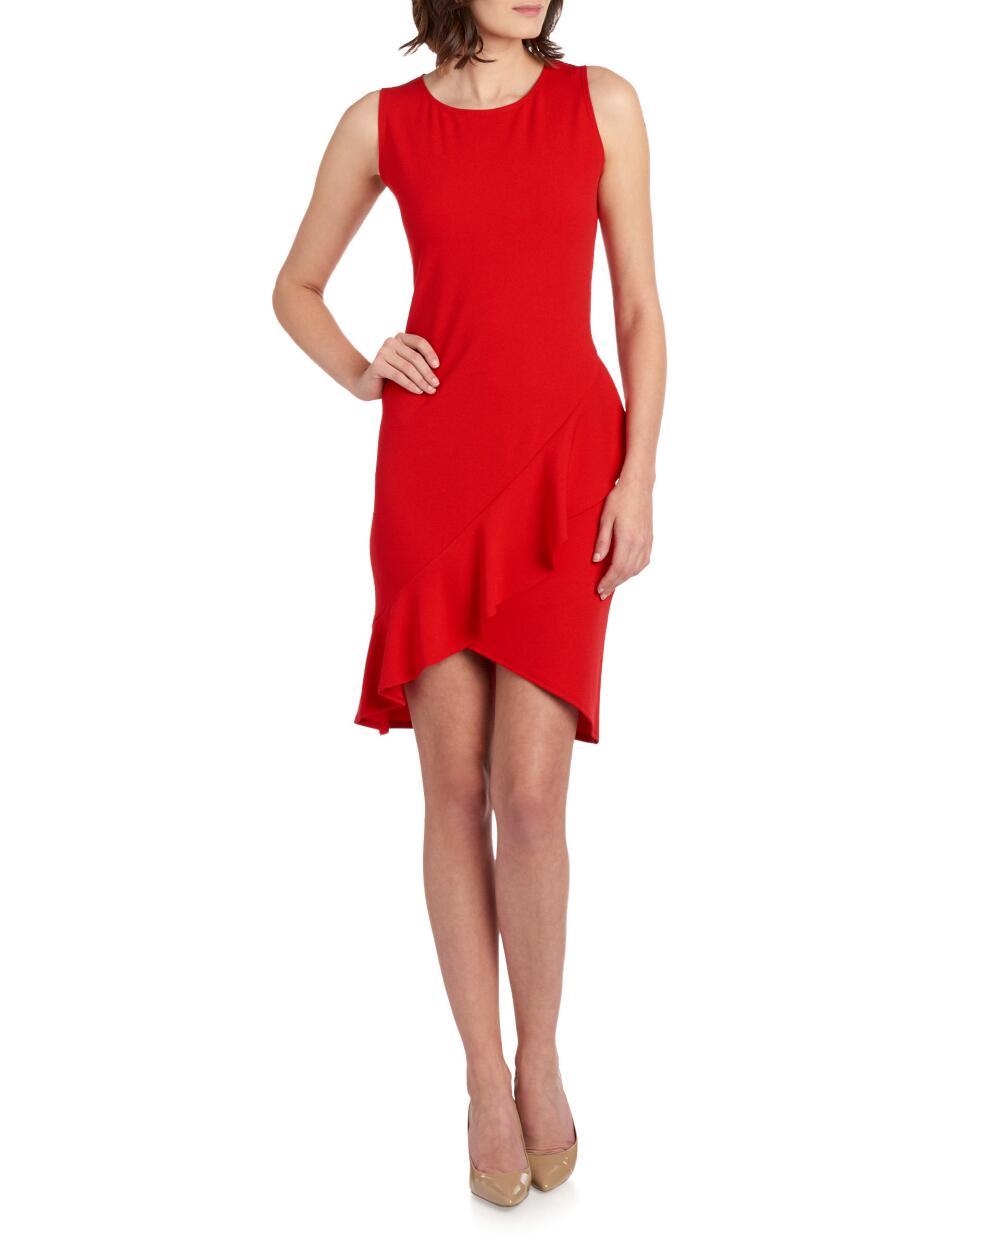 Bebe Ruffled Asymmetrical Sheath Dress | Hermosaz